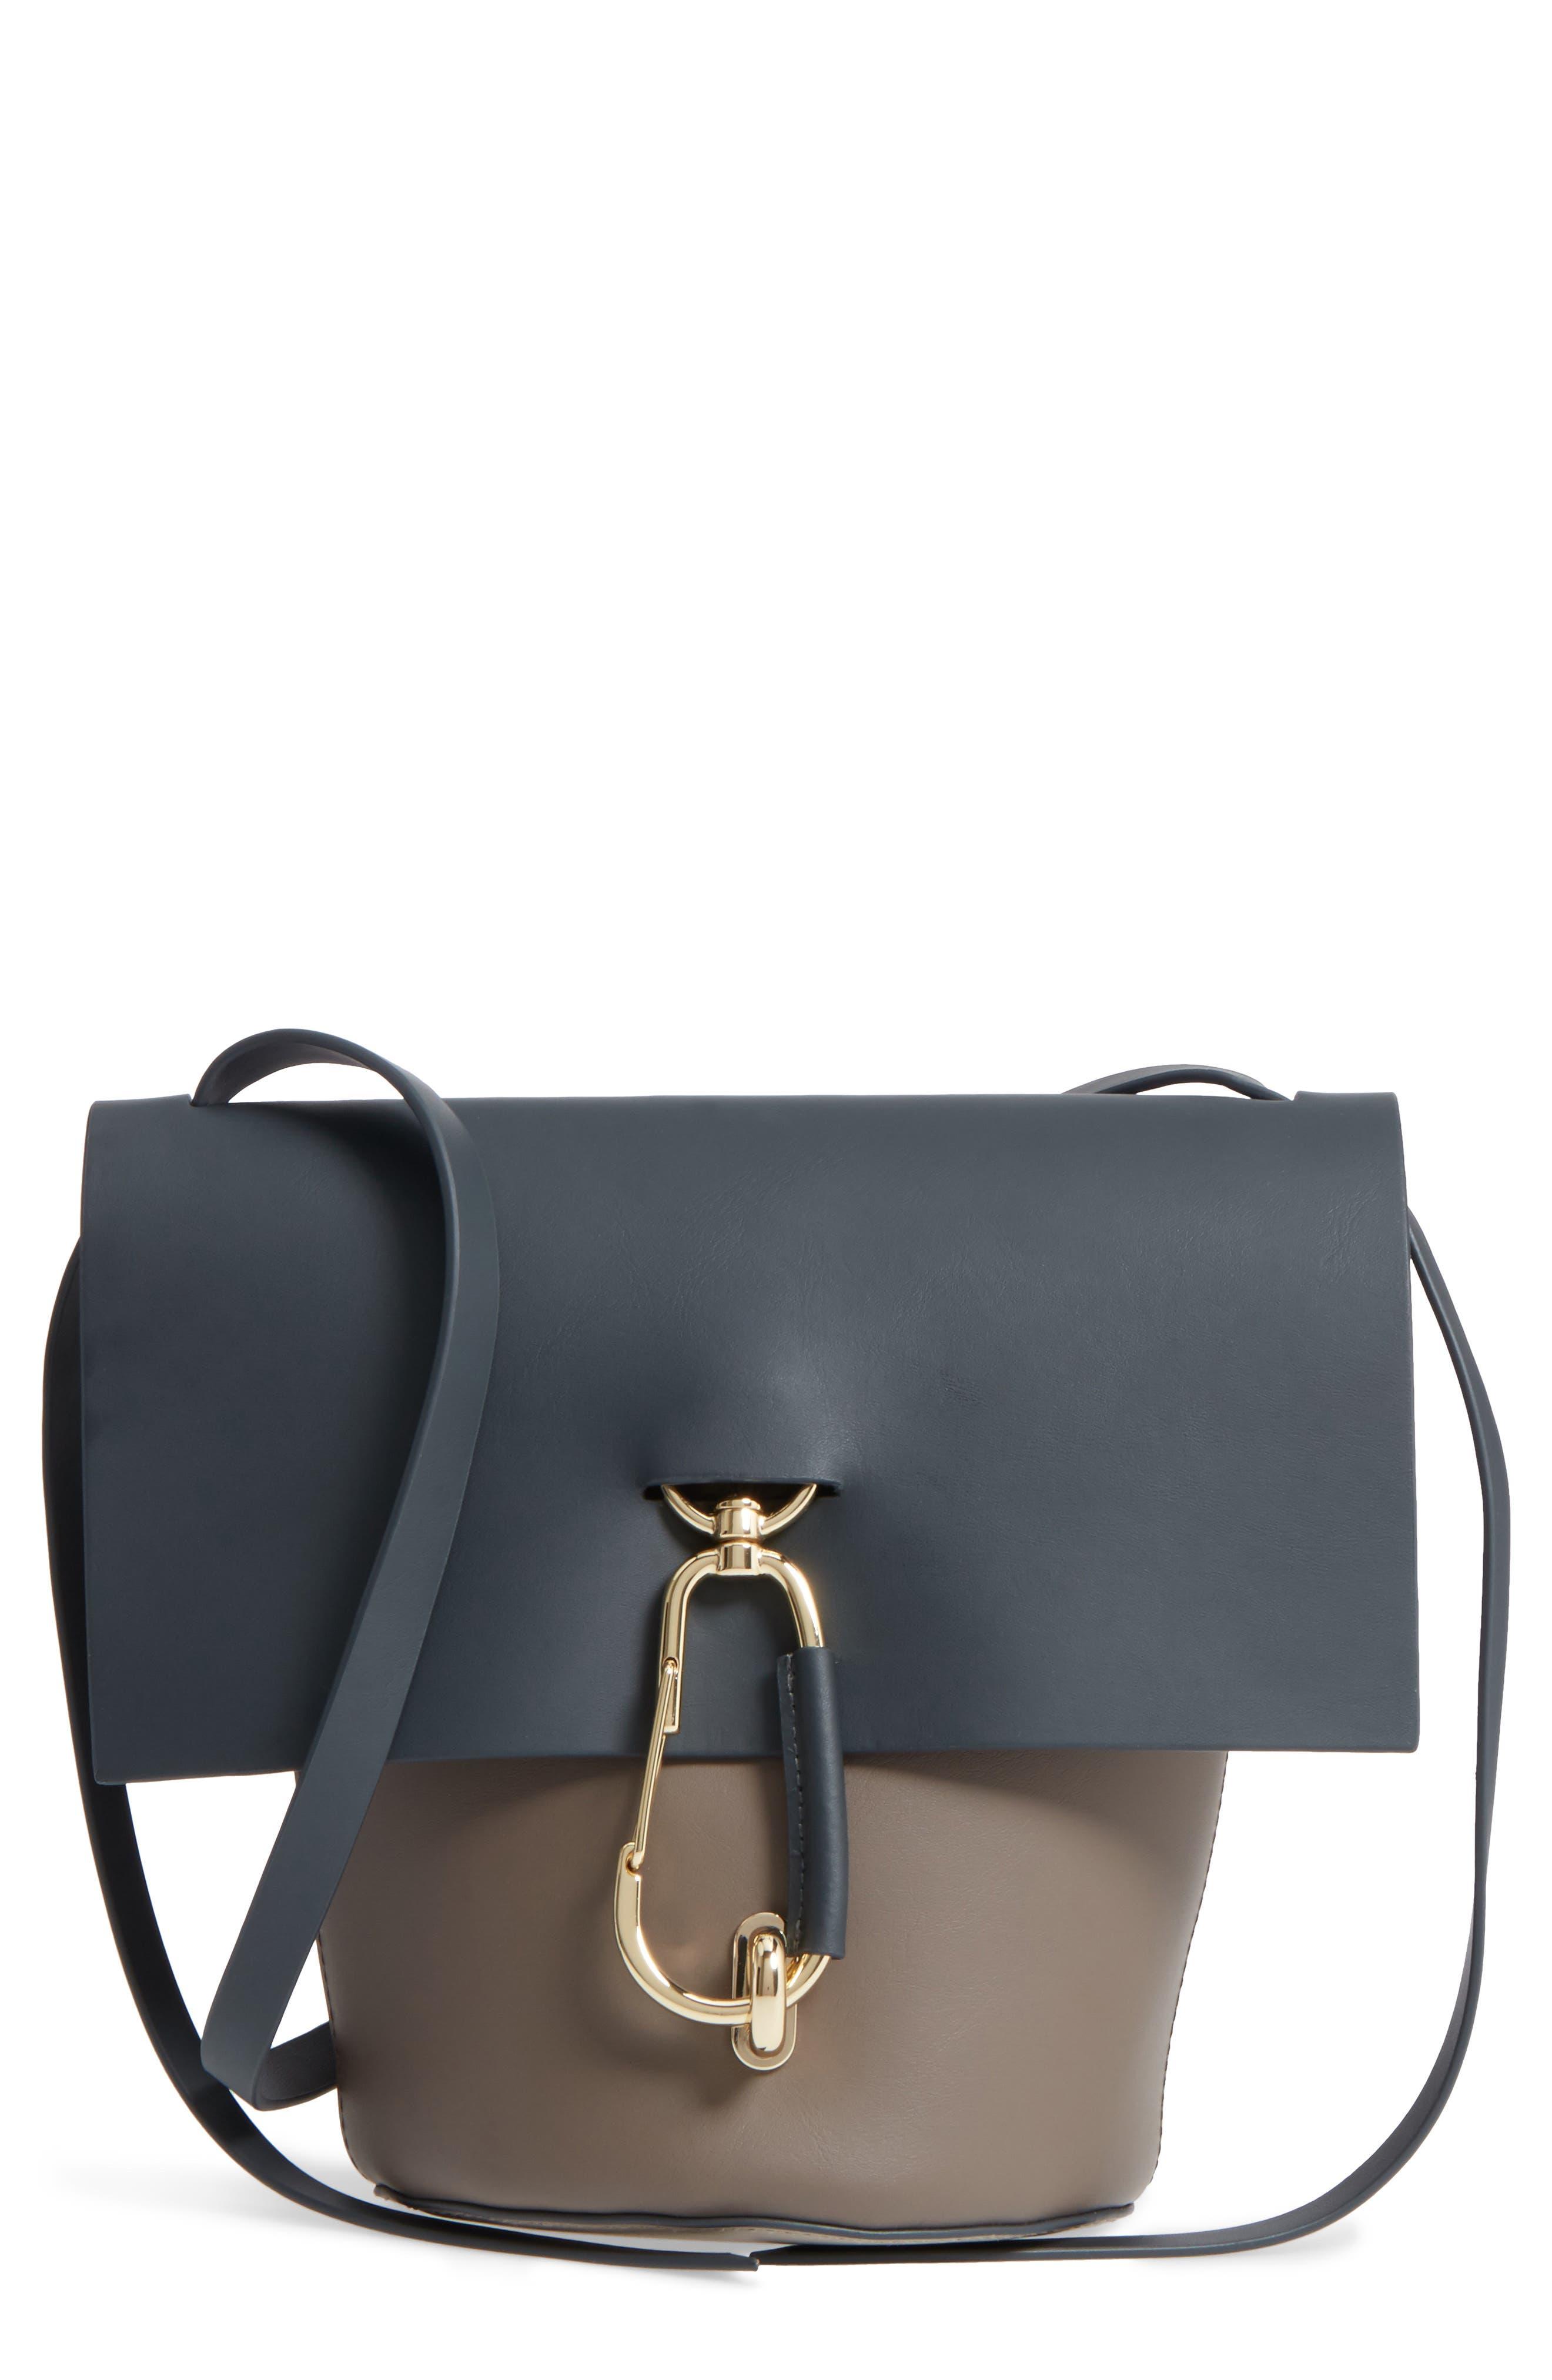 Belay Colorblock Leather Crossbody Bag,                             Main thumbnail 1, color,                             020